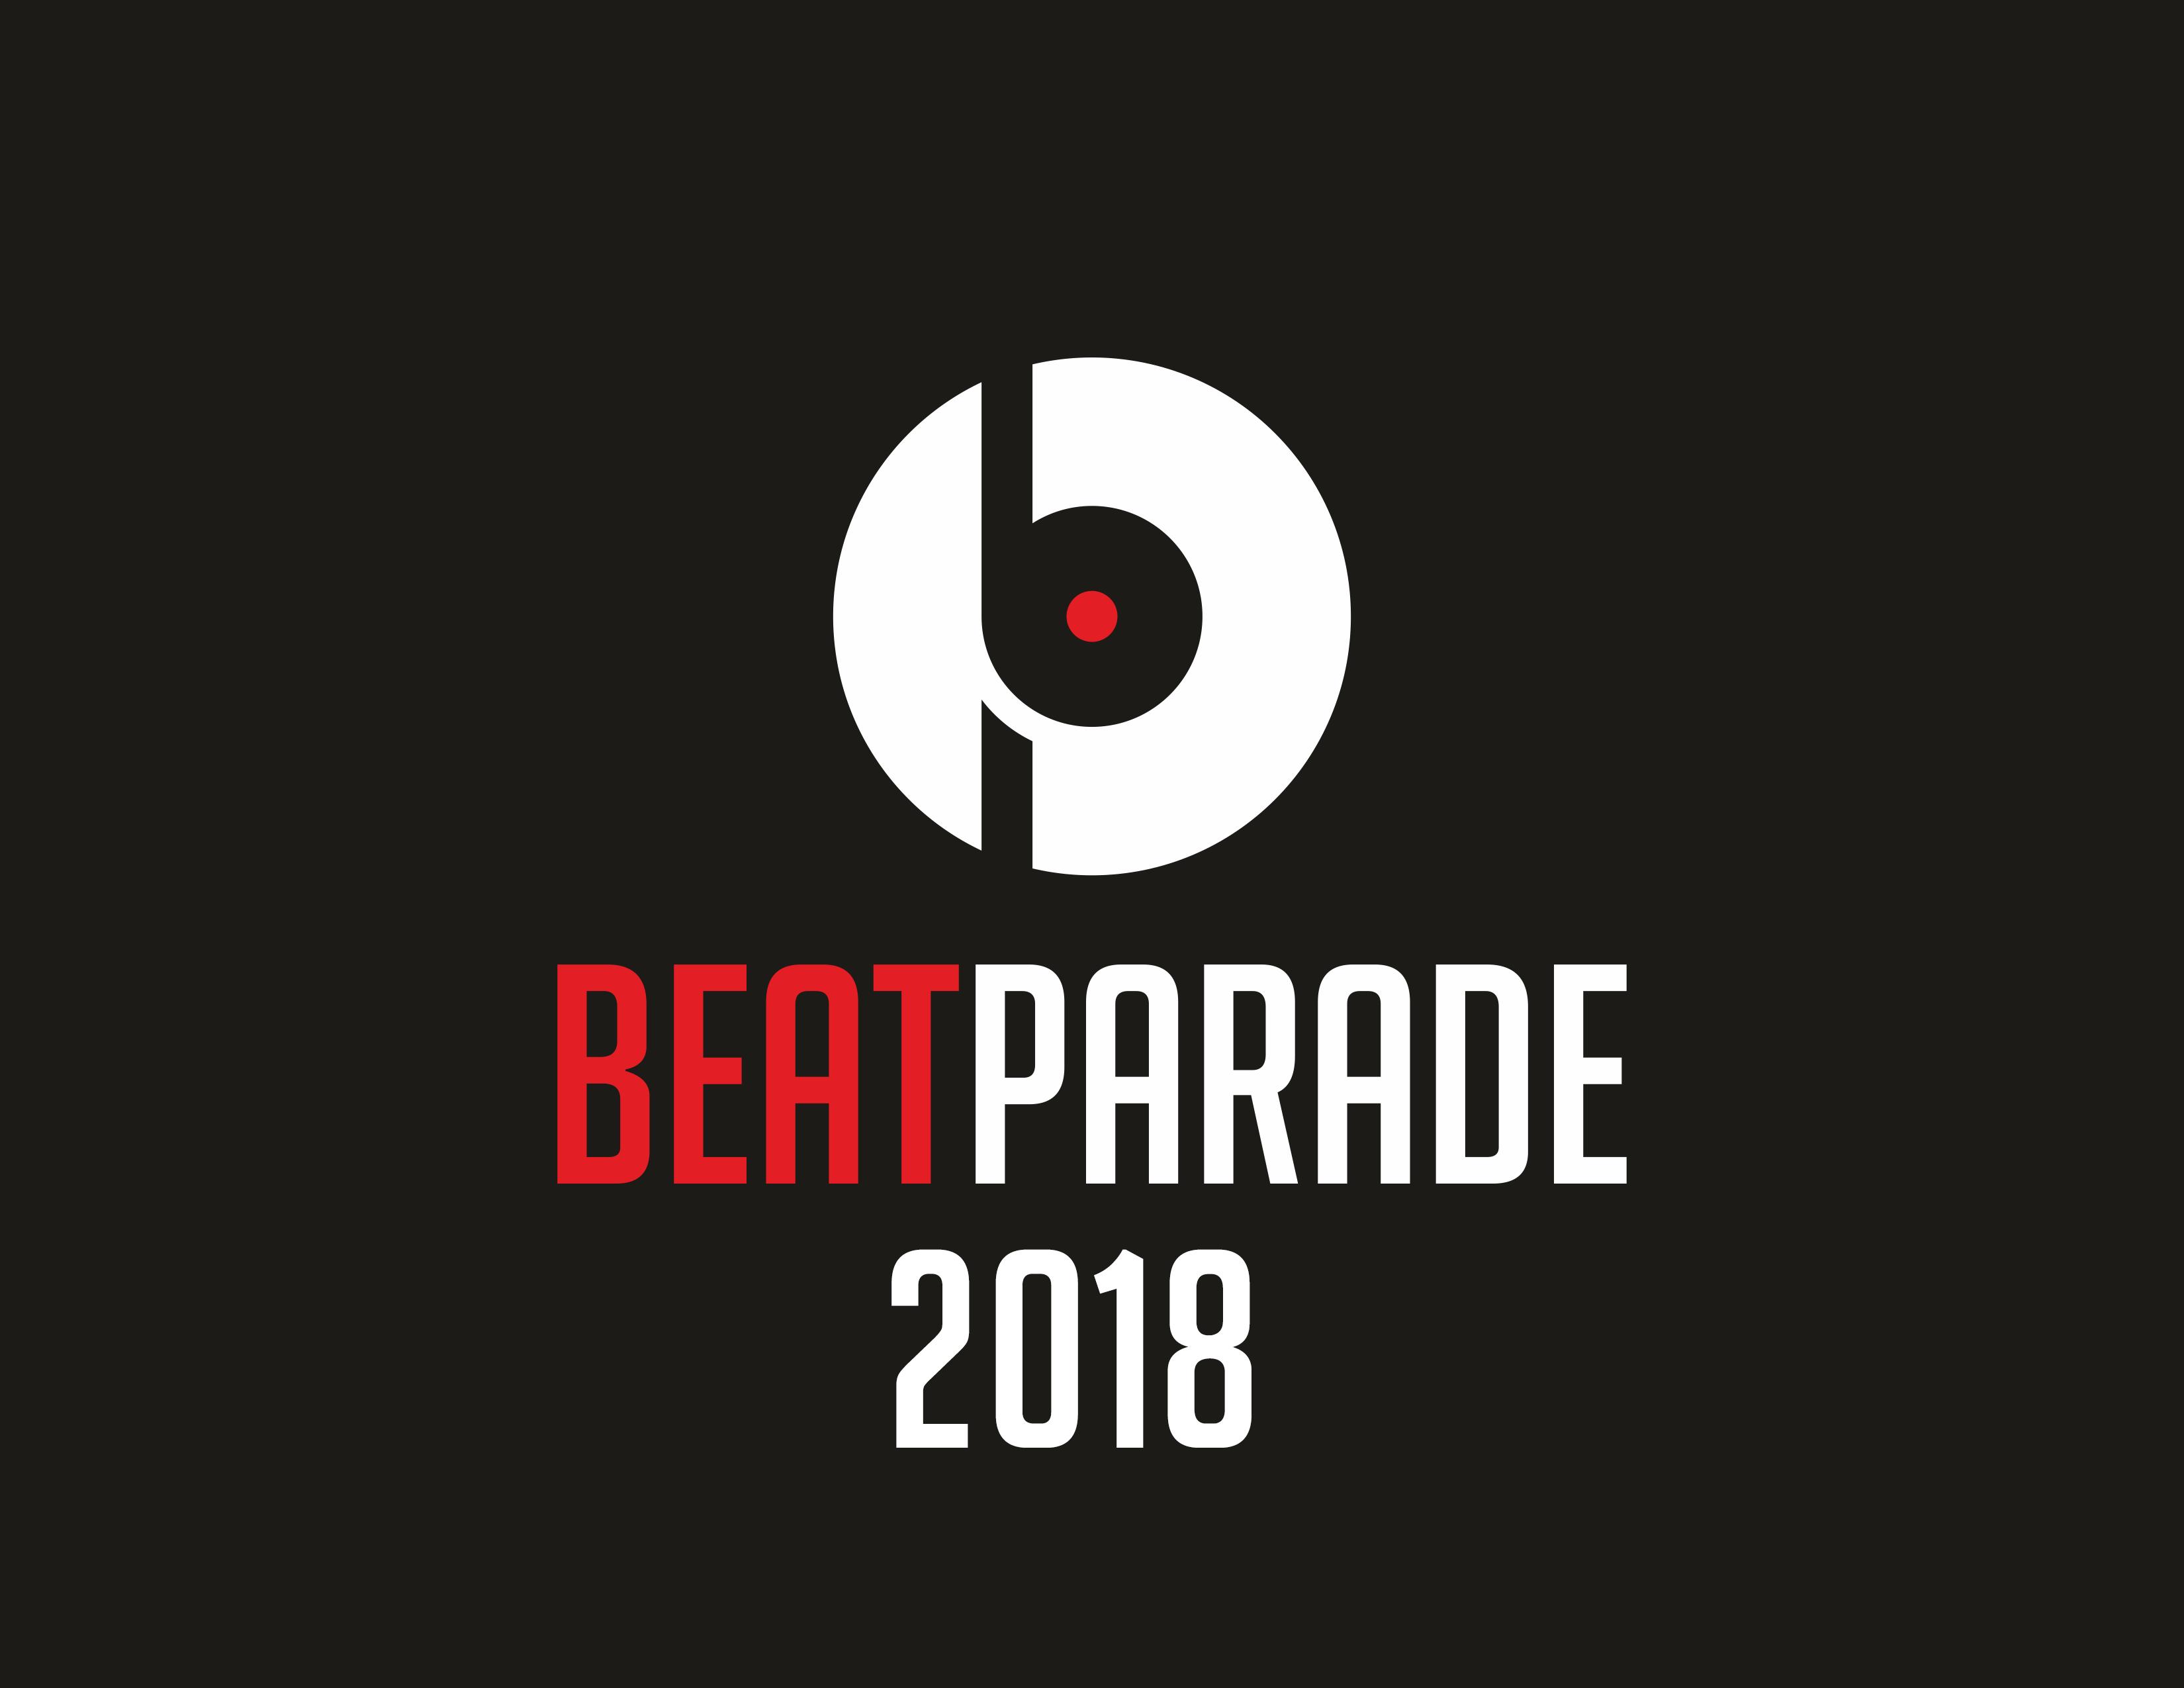 BEATPARADE 2018 - Official Aftermovie